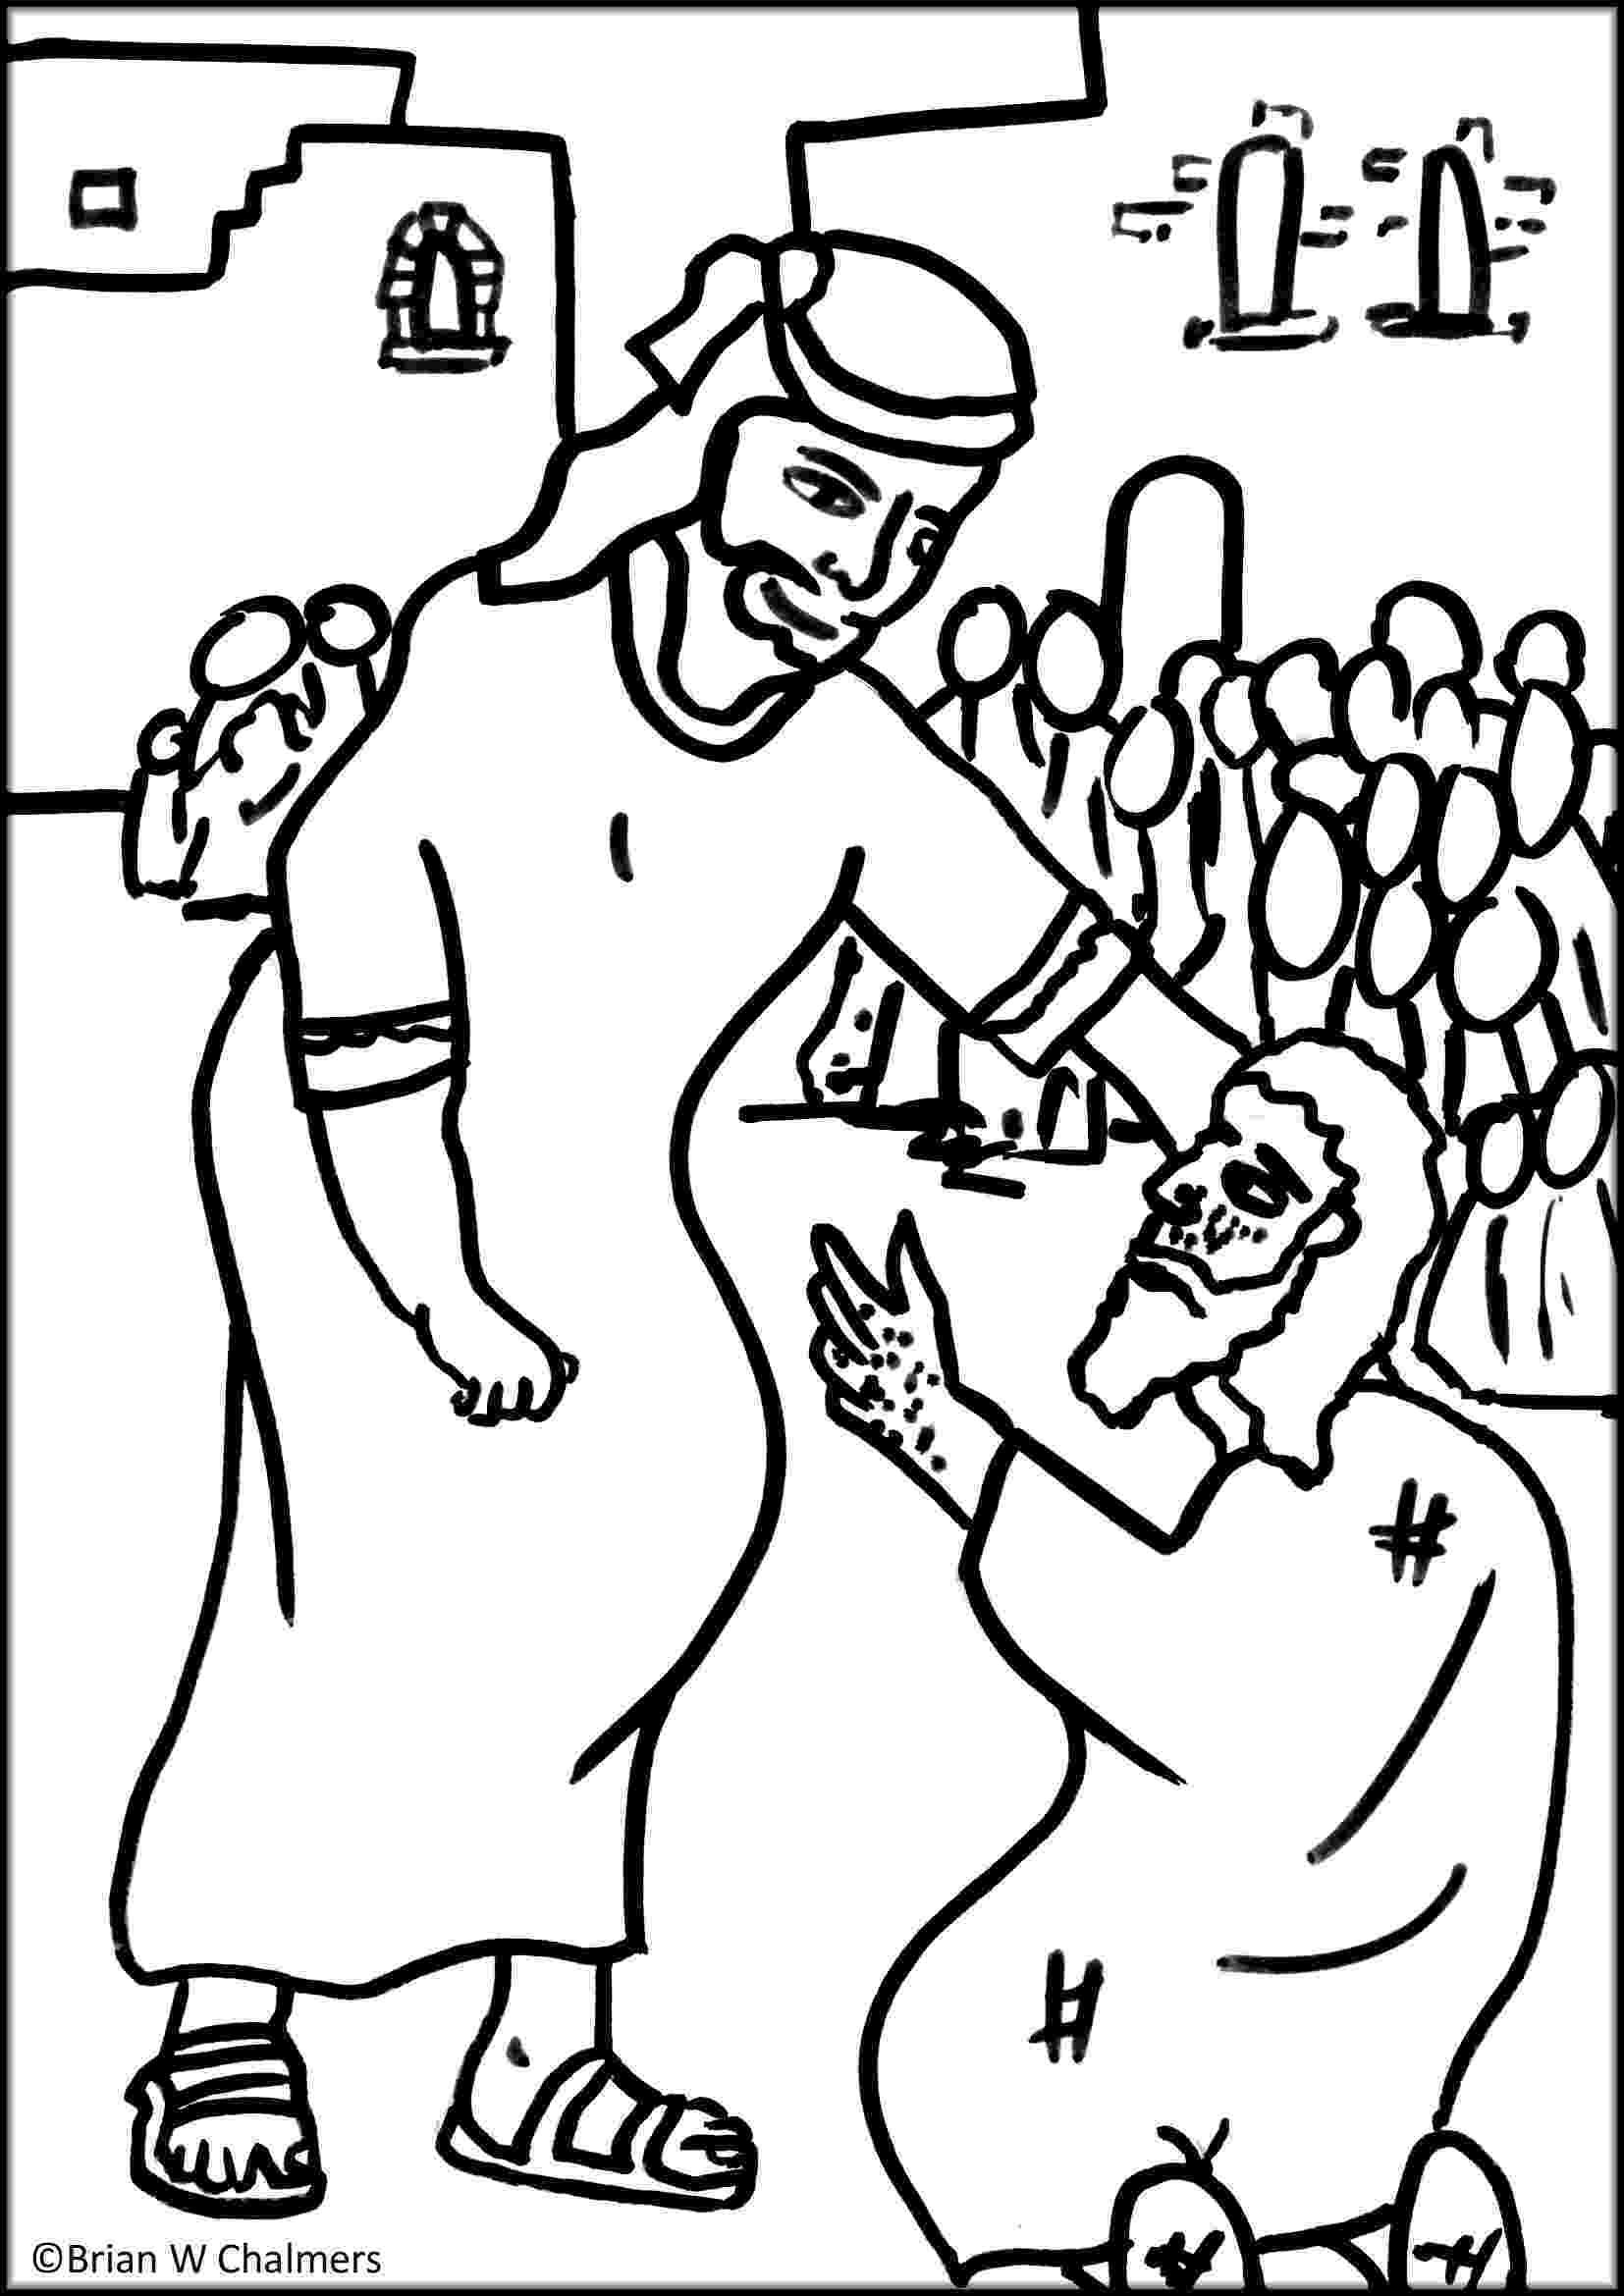 jesus heals a leper coloring page jesus heals a man with leprosy coloring page coloring pages coloring page heals jesus a leper